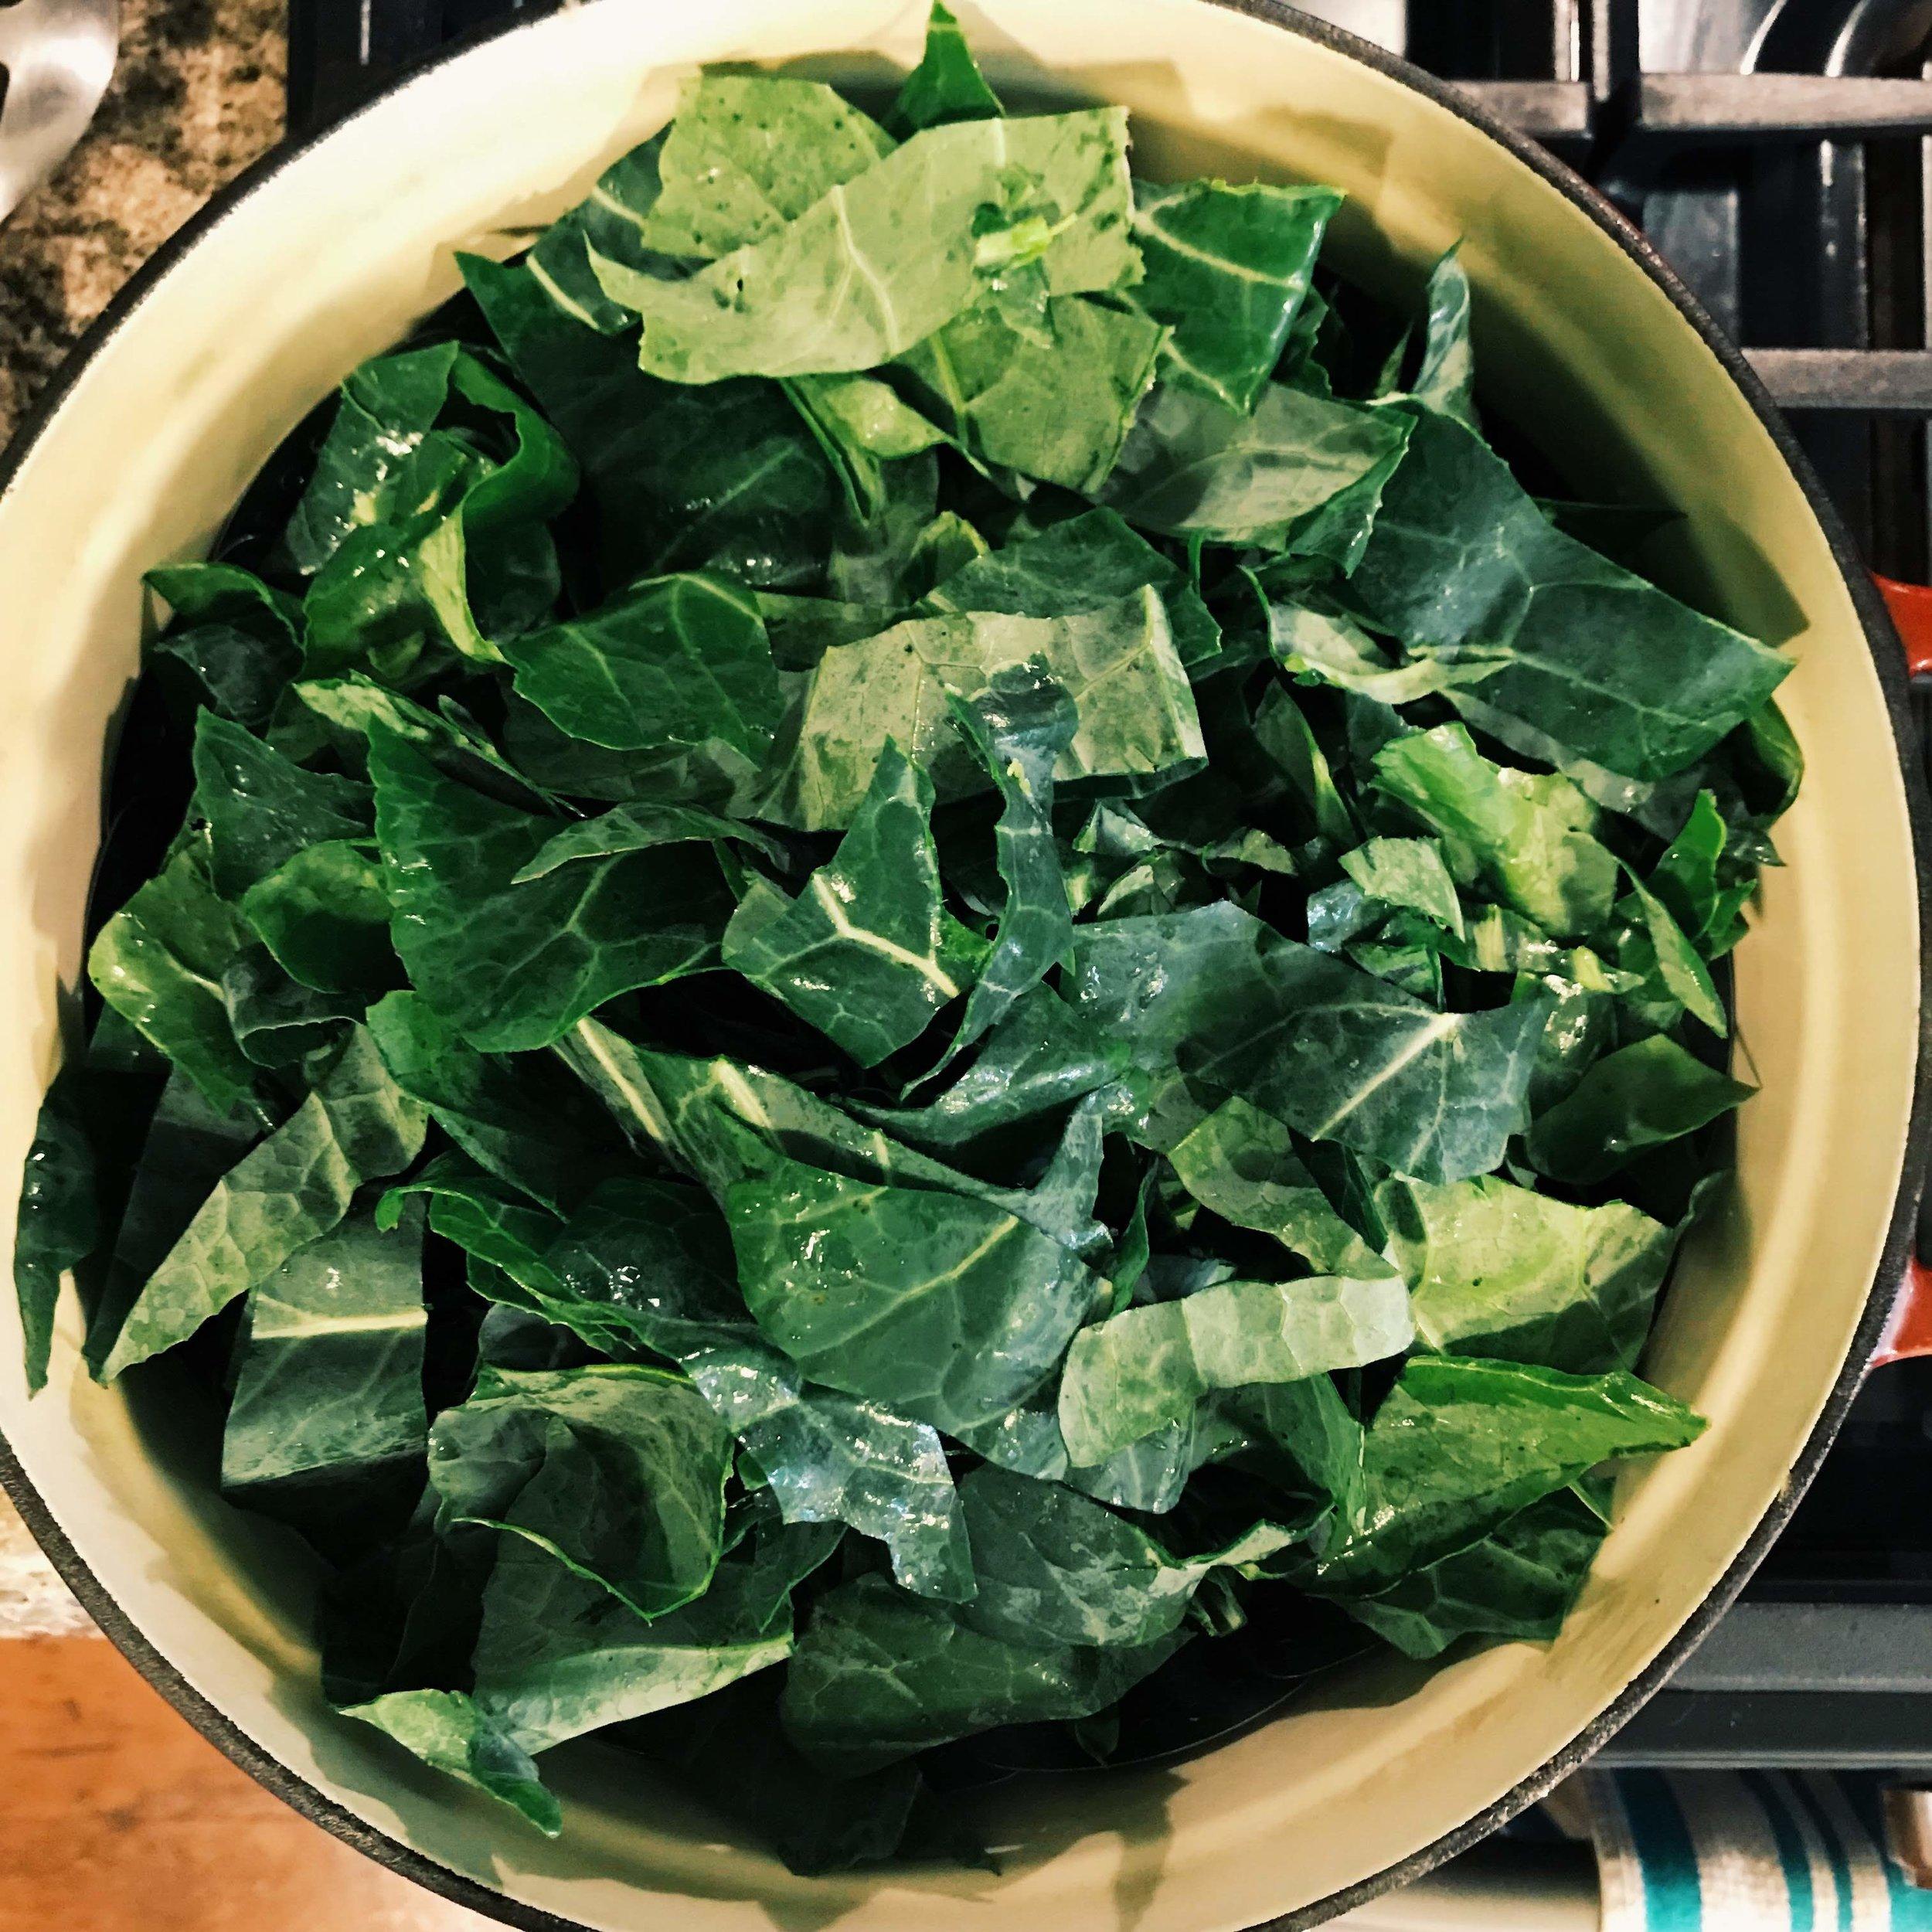 - Dark Leafy Greens and Cruciferous Veggies